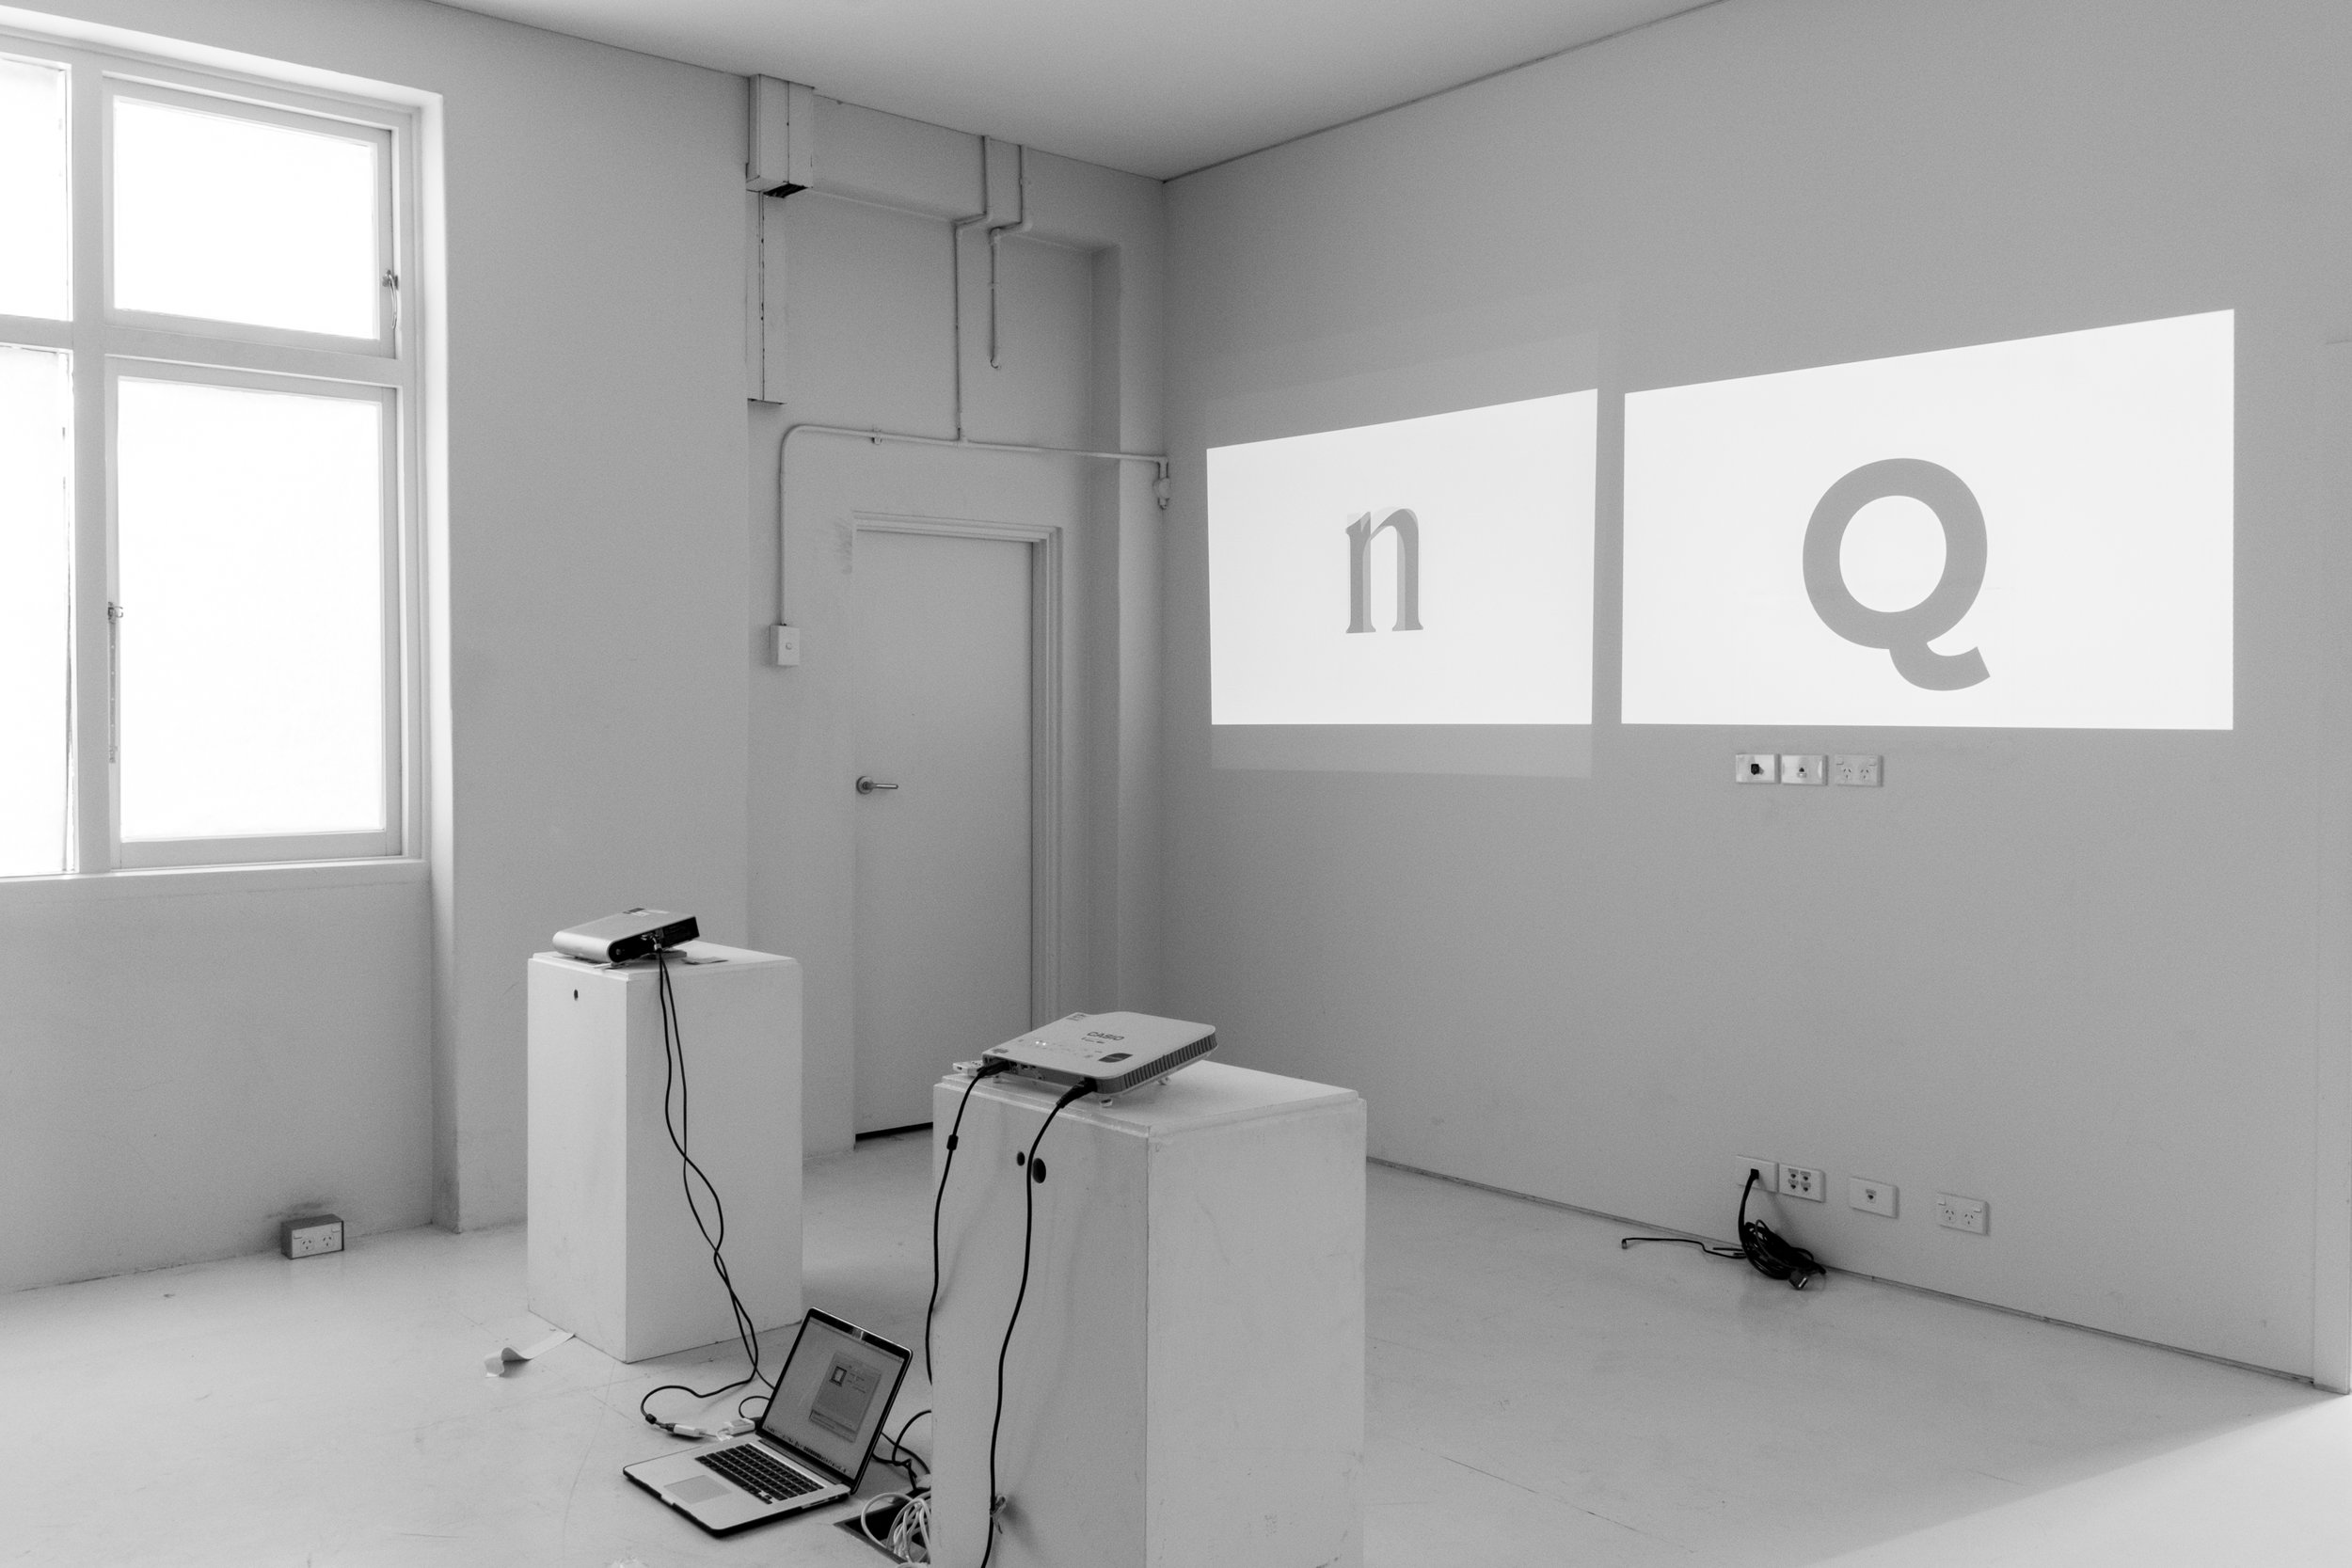 Exhibition-79.jpg